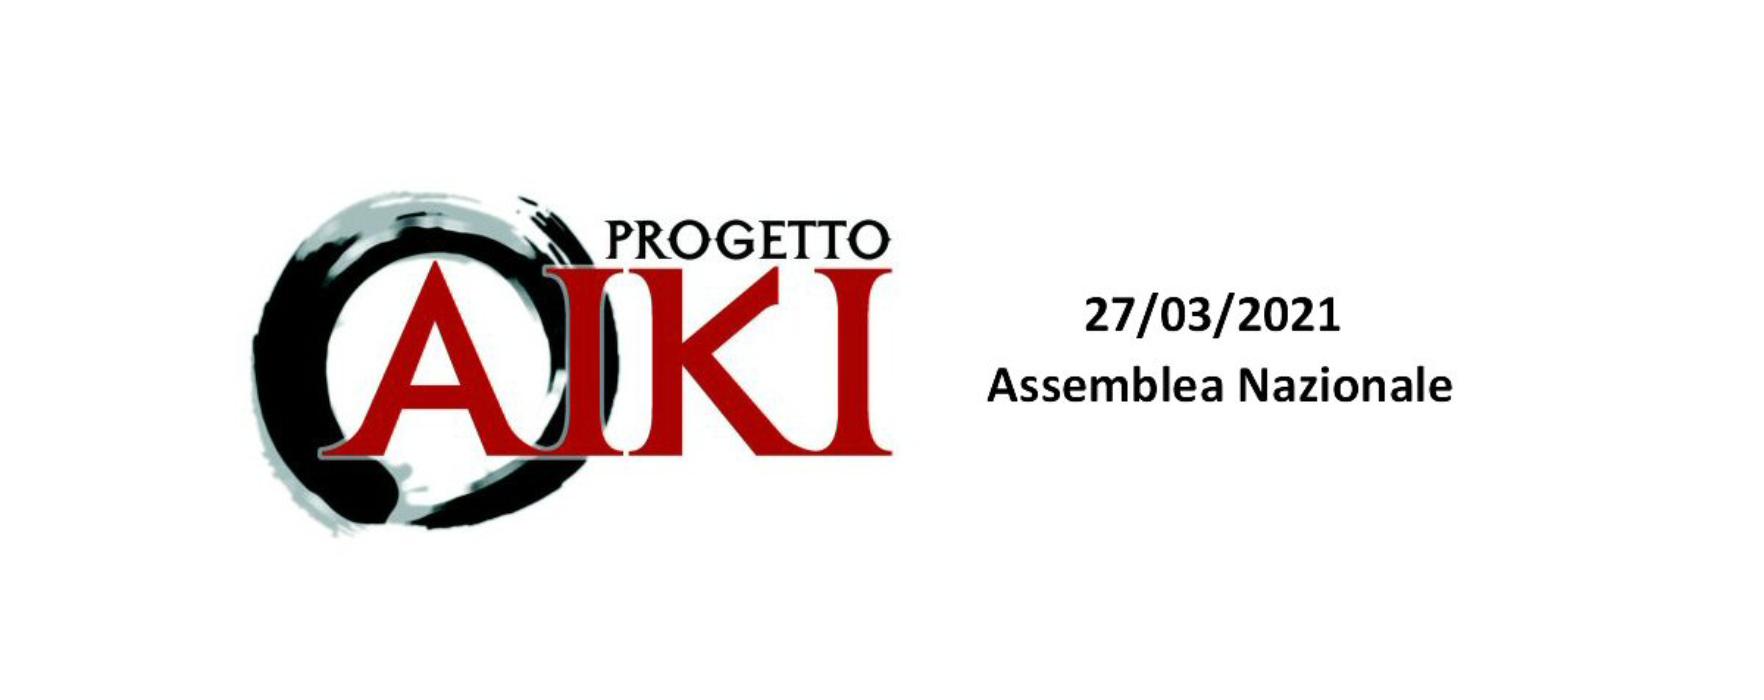 Assemblea Nazionale 2021 ProgettoAiki